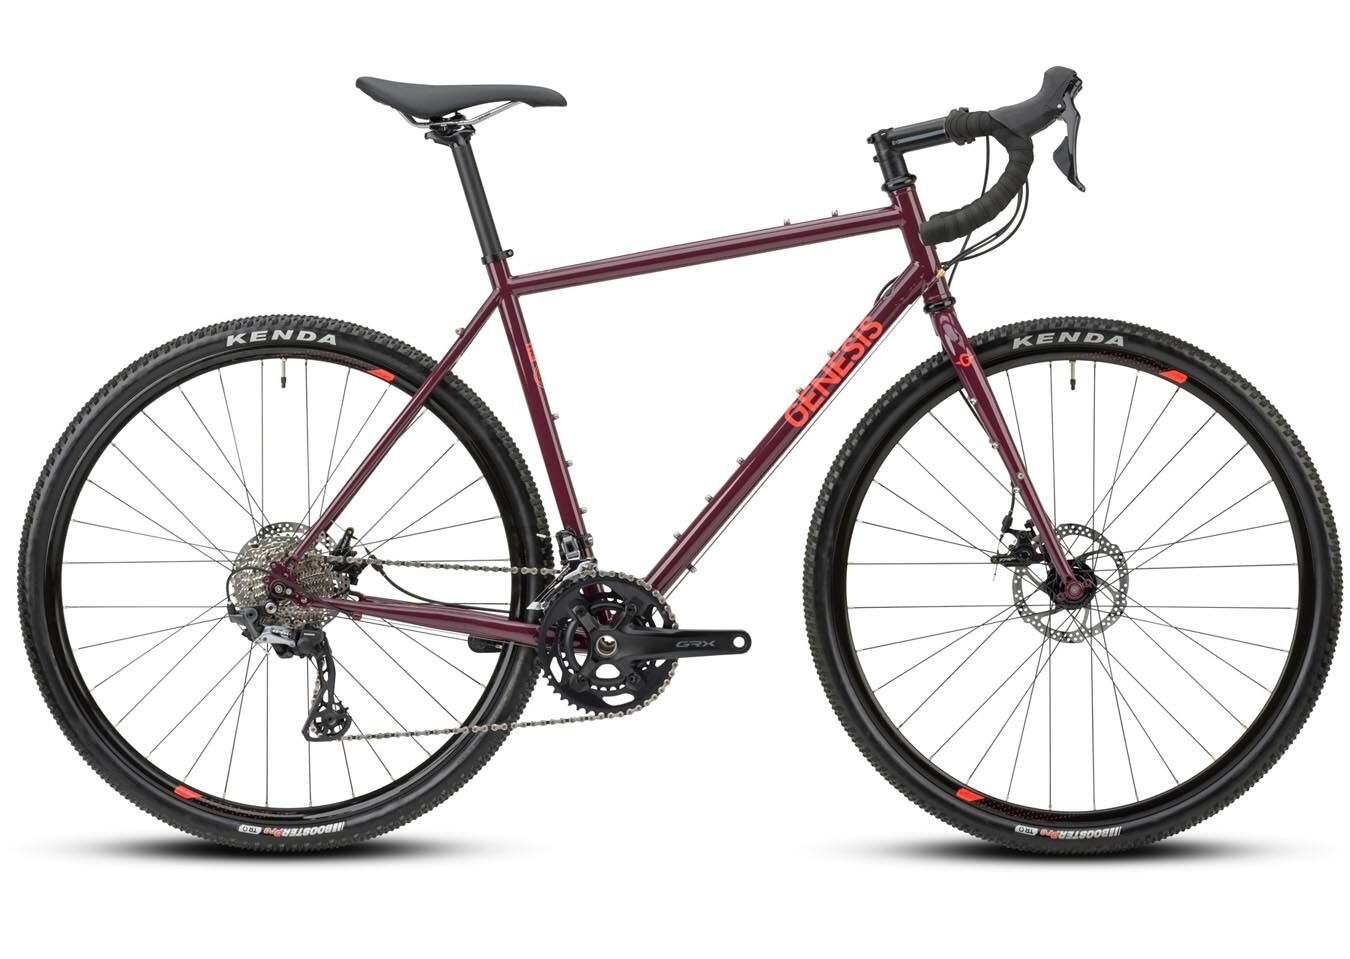 Genesis Croi De Fer 30 Gravel Bike